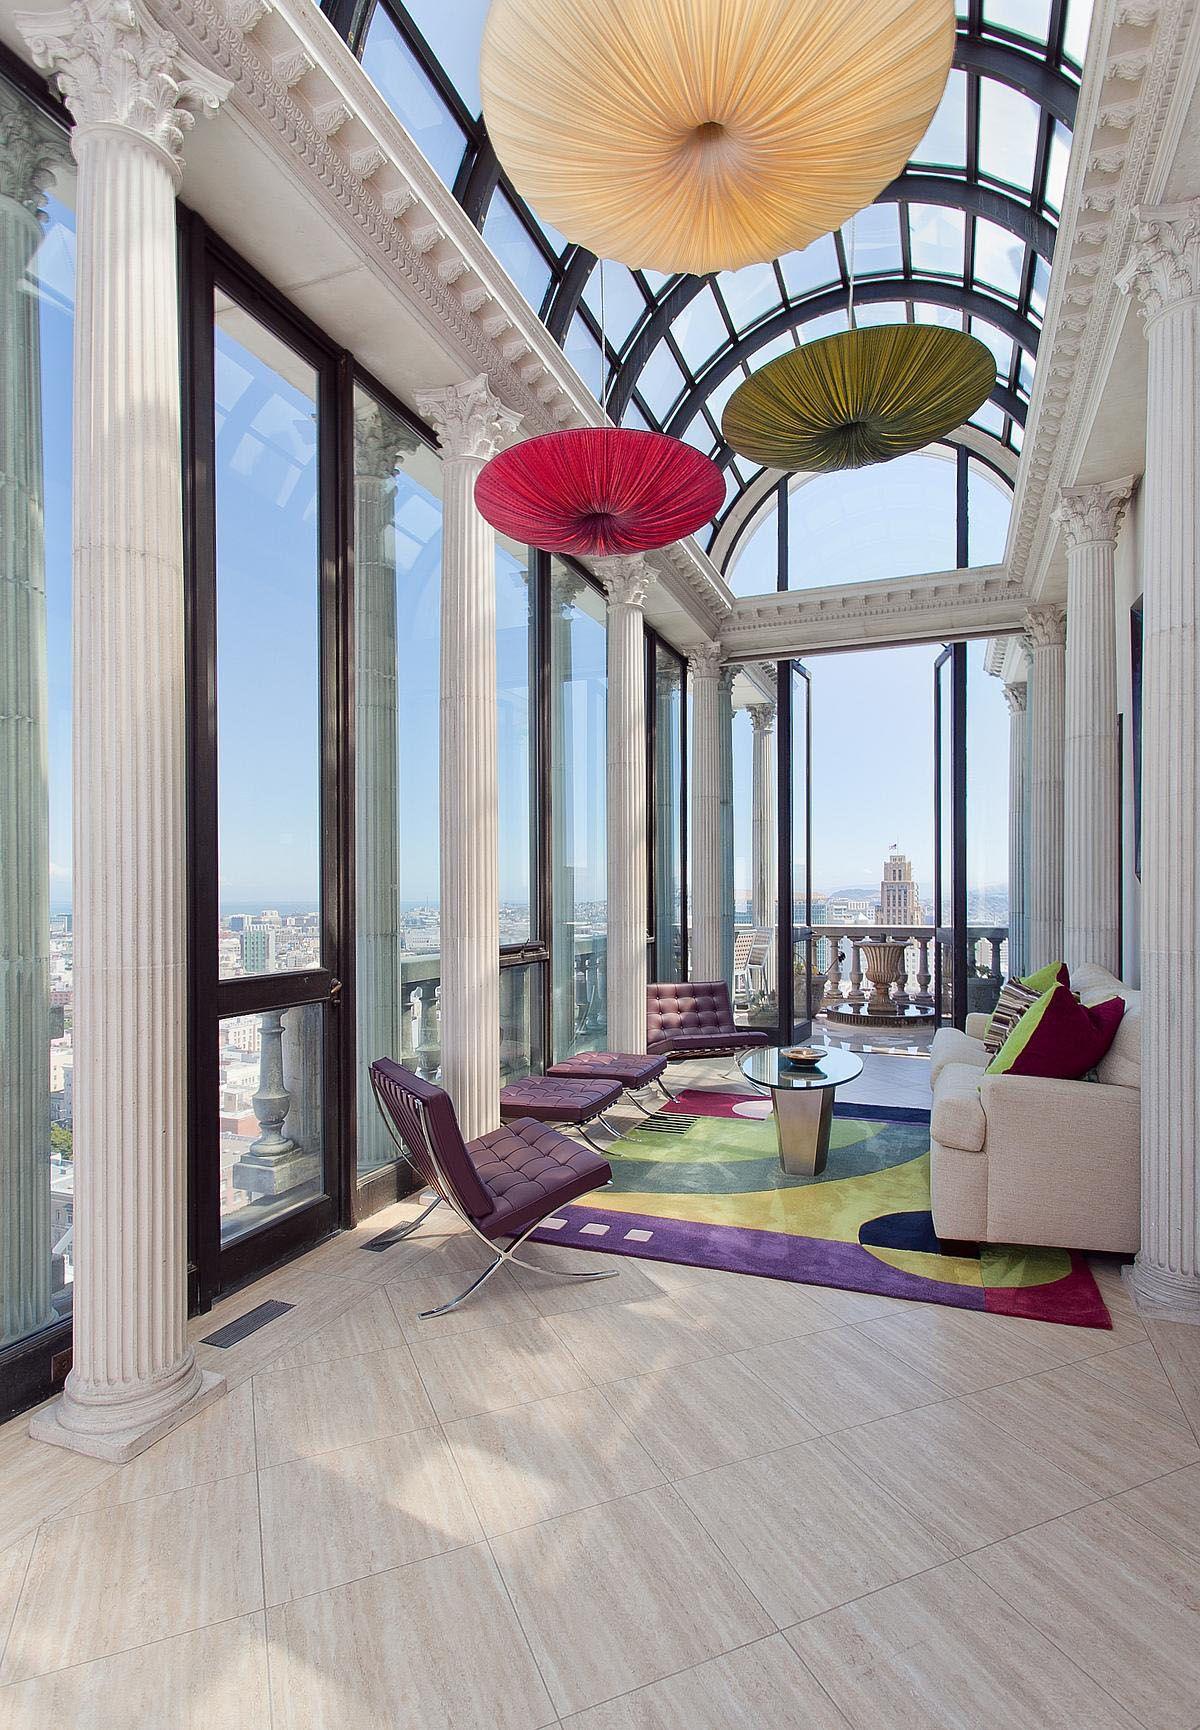 Appartment In The Hamilton, Art Deco Building Located In